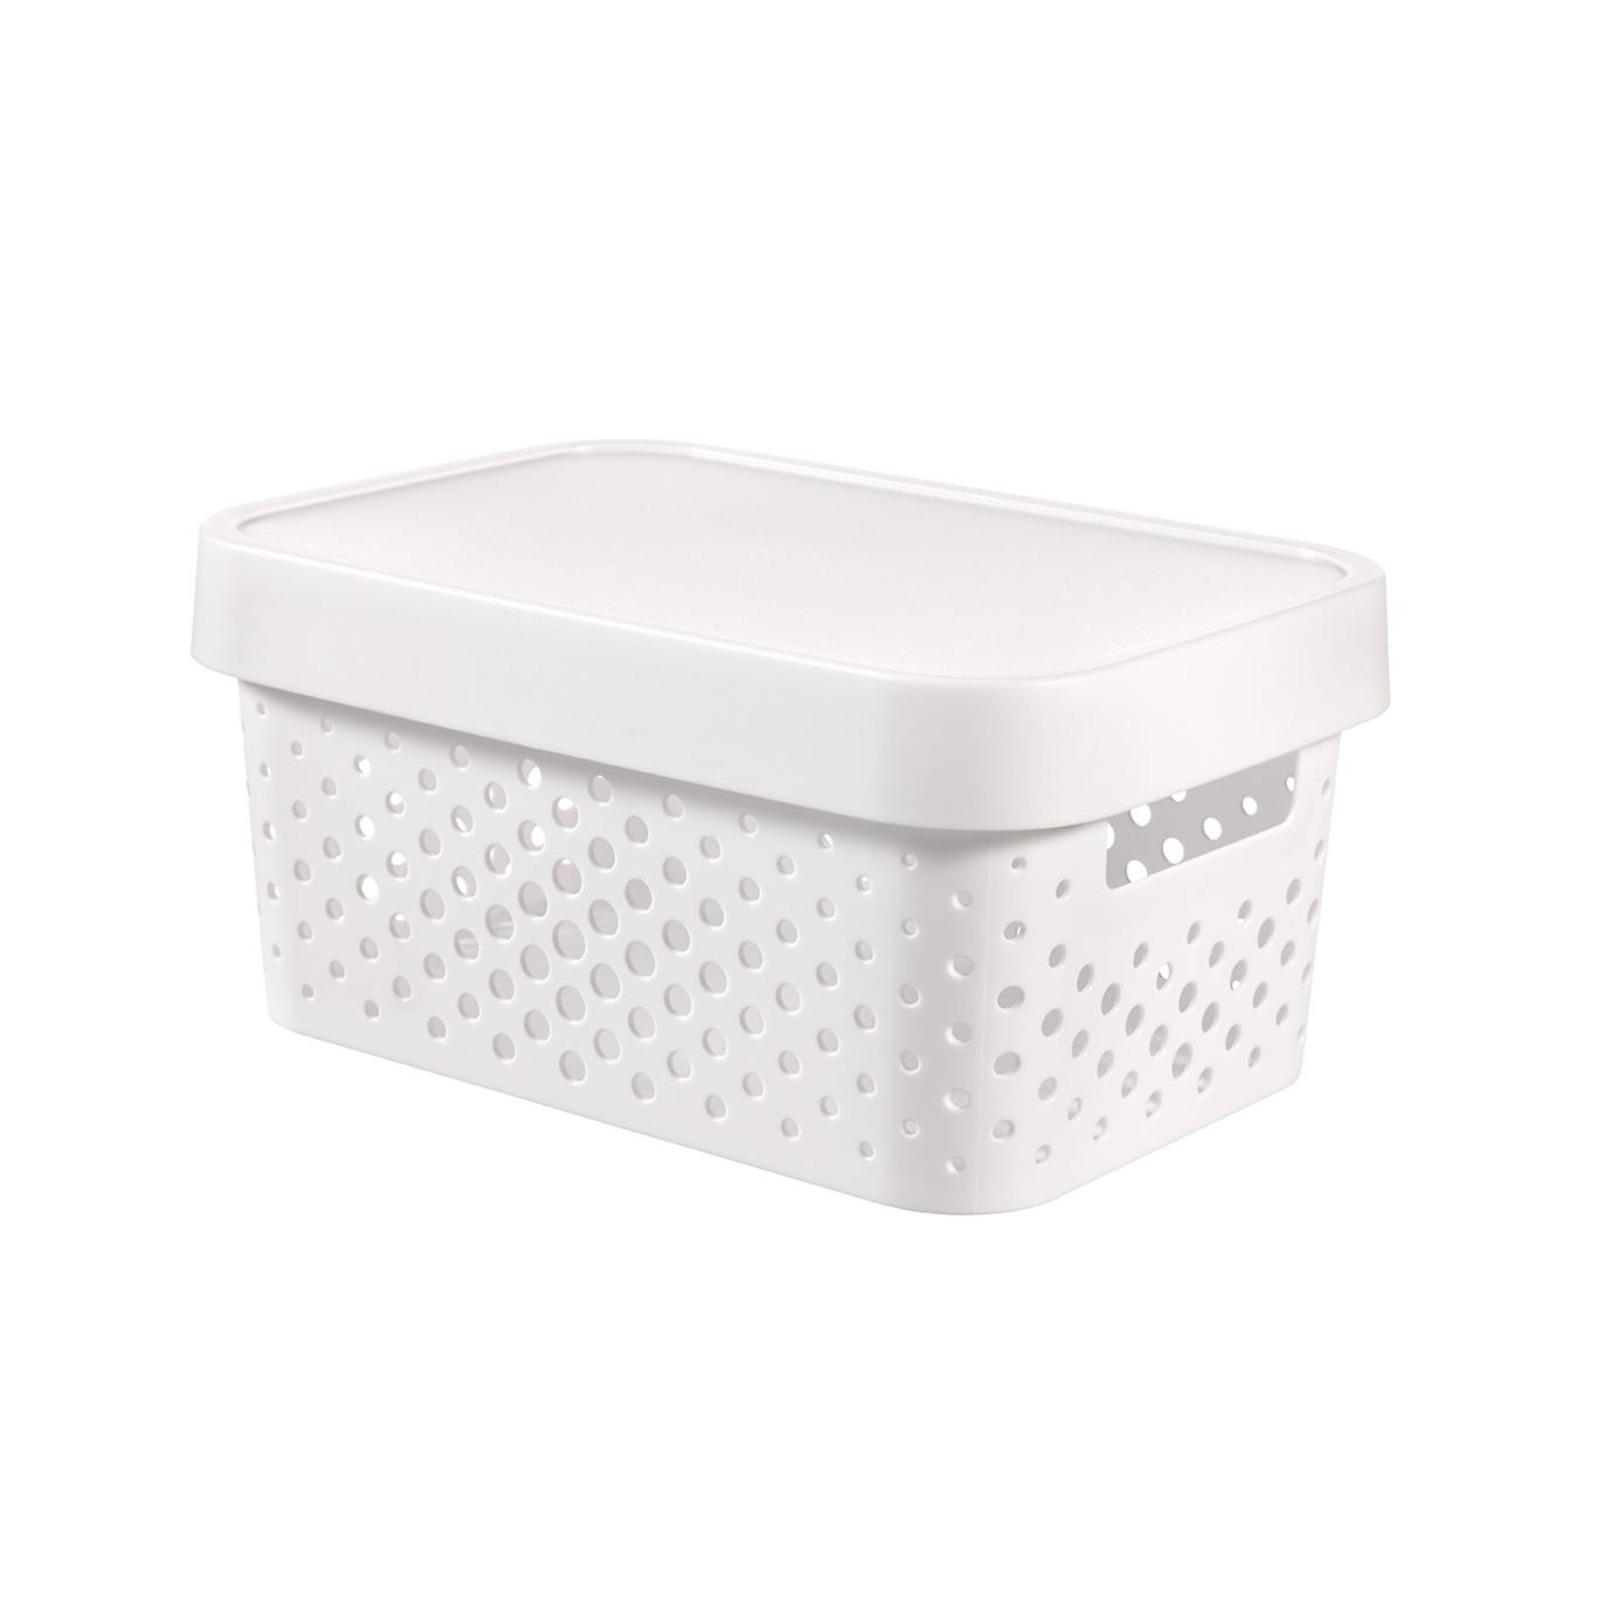 CURVER Infinity Box Dots 4.5L + Lid White